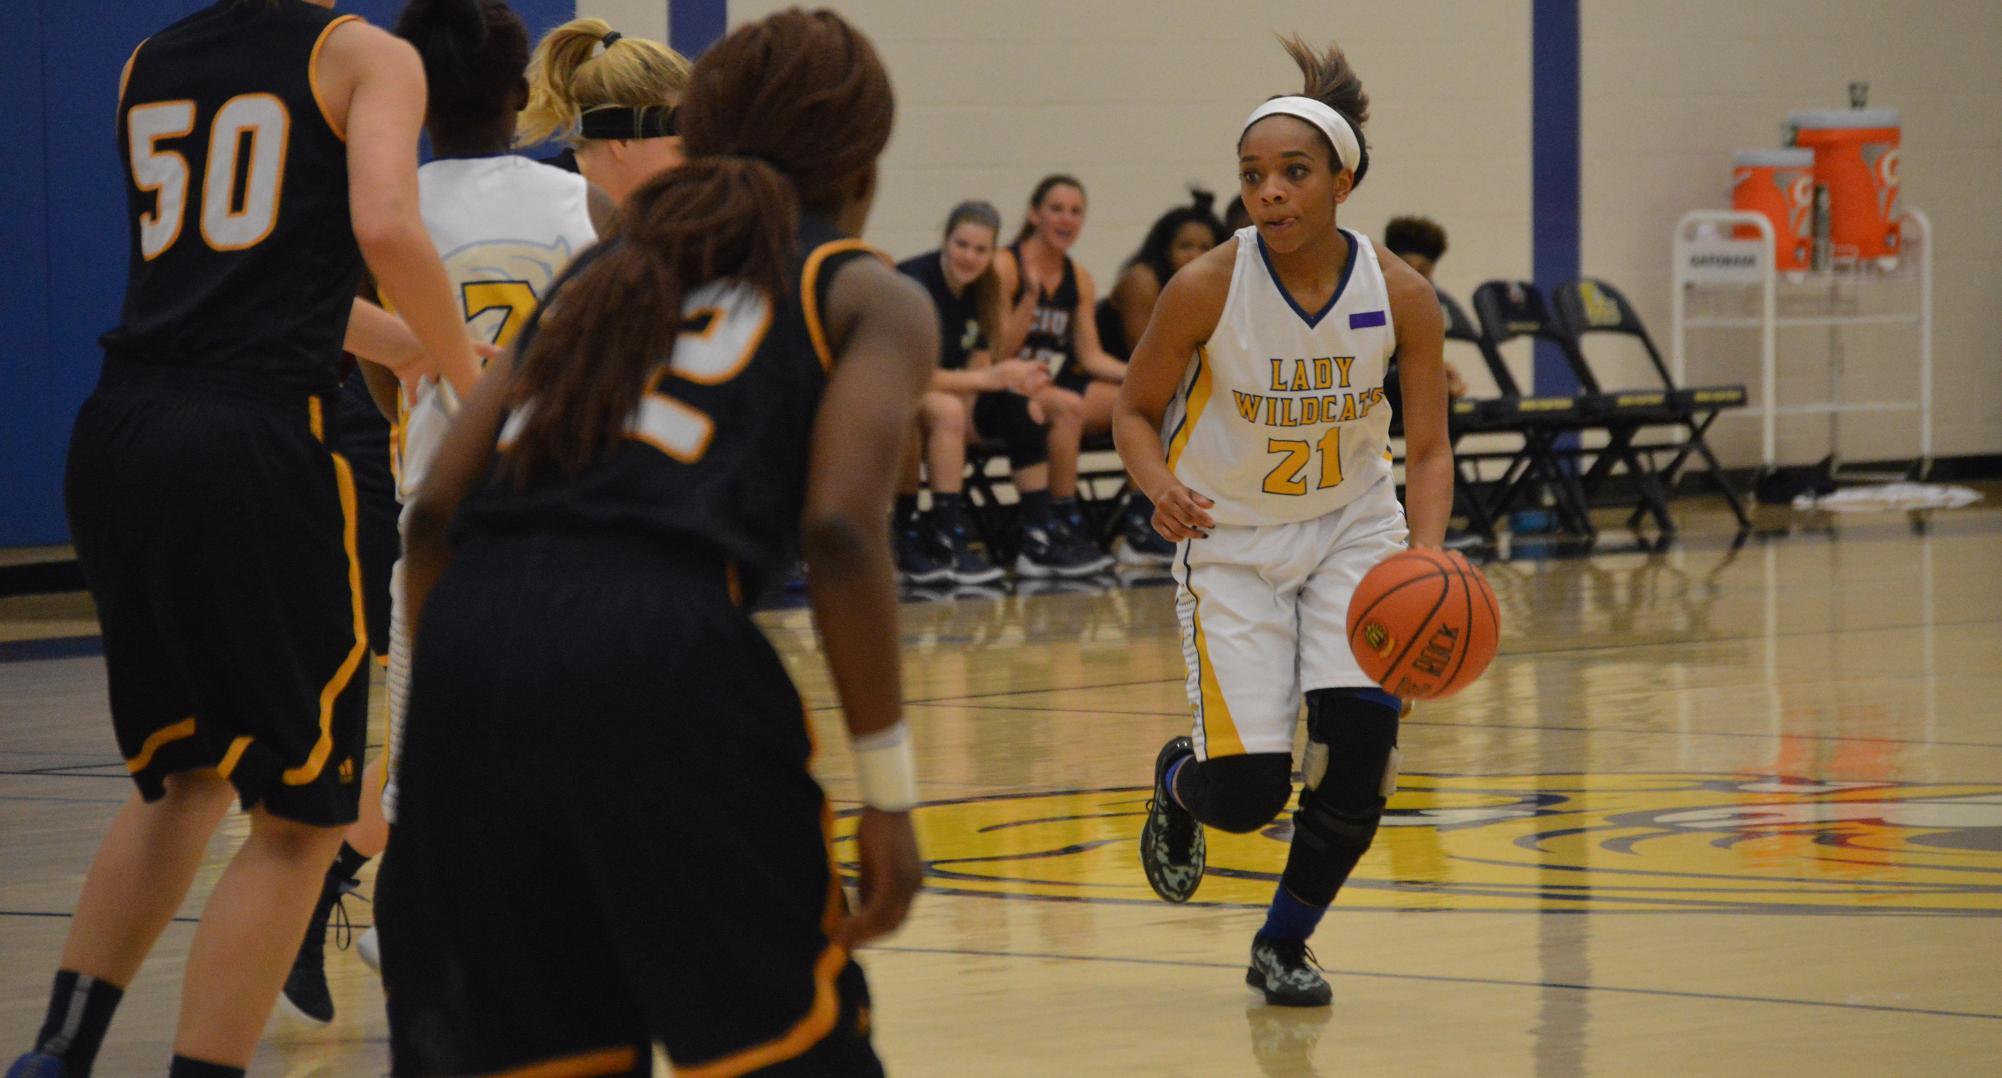 108cdc015b3e Ford Scores Career High 17 as Women s Basketball Tops CIU - Johnson ...